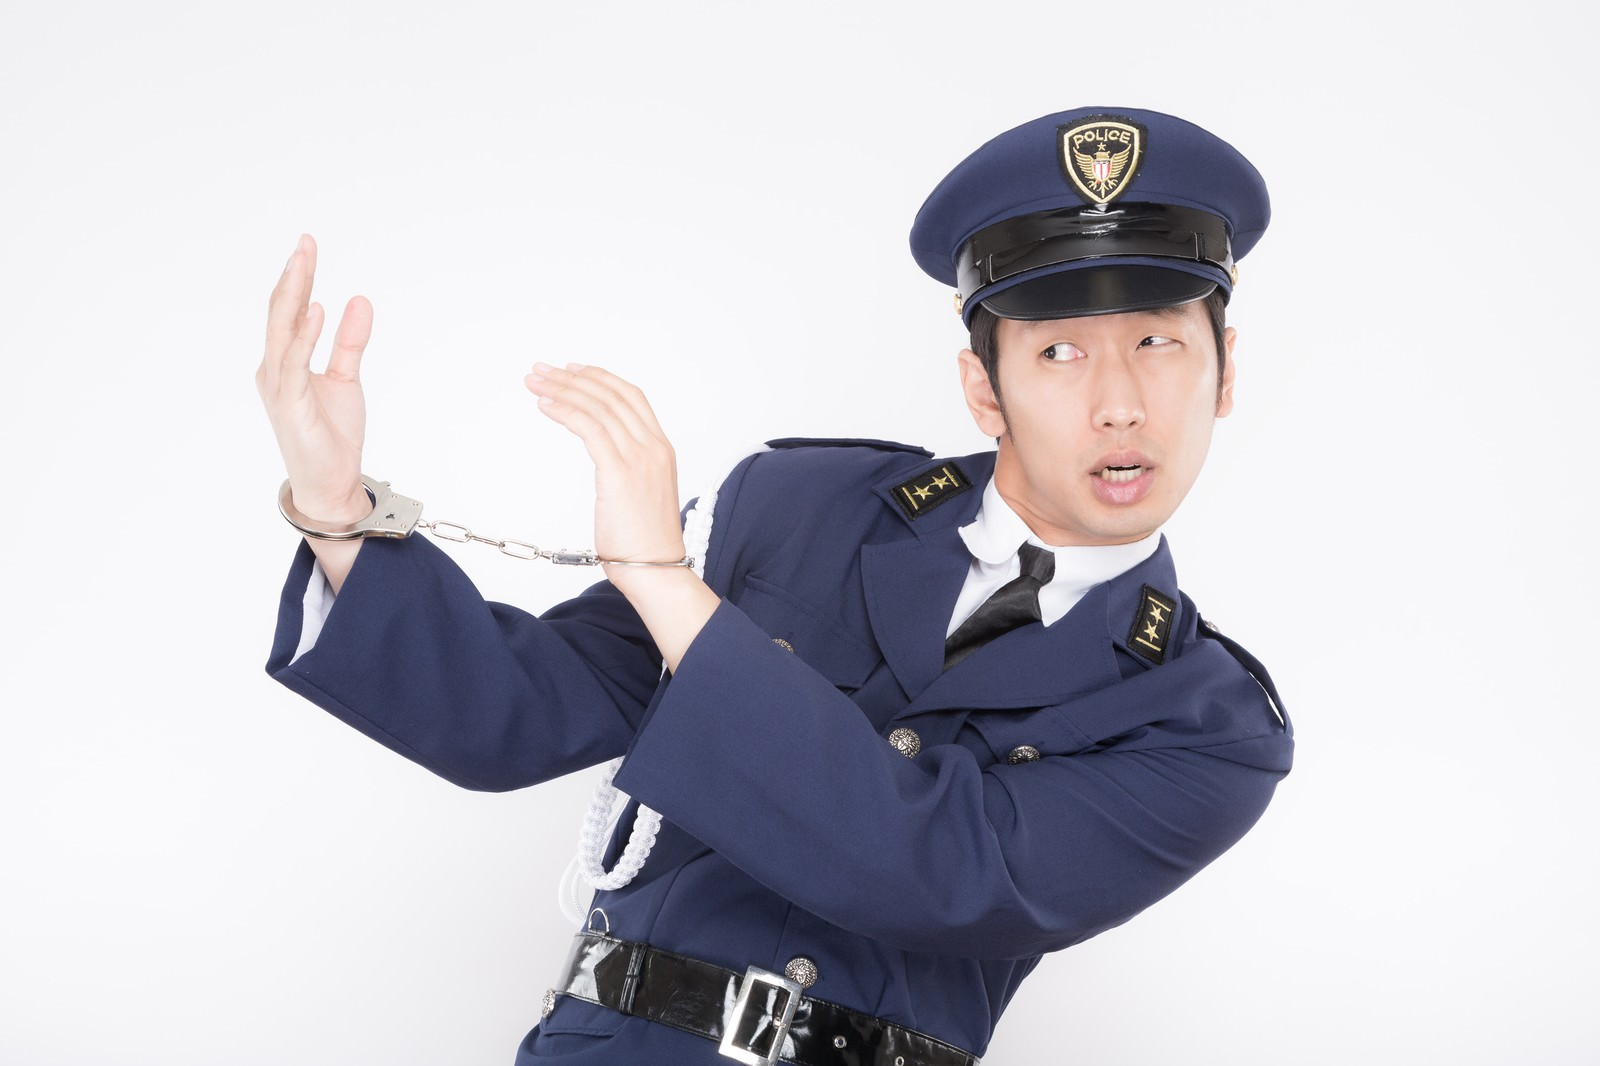 Ookawa151107168343 TP V policeman